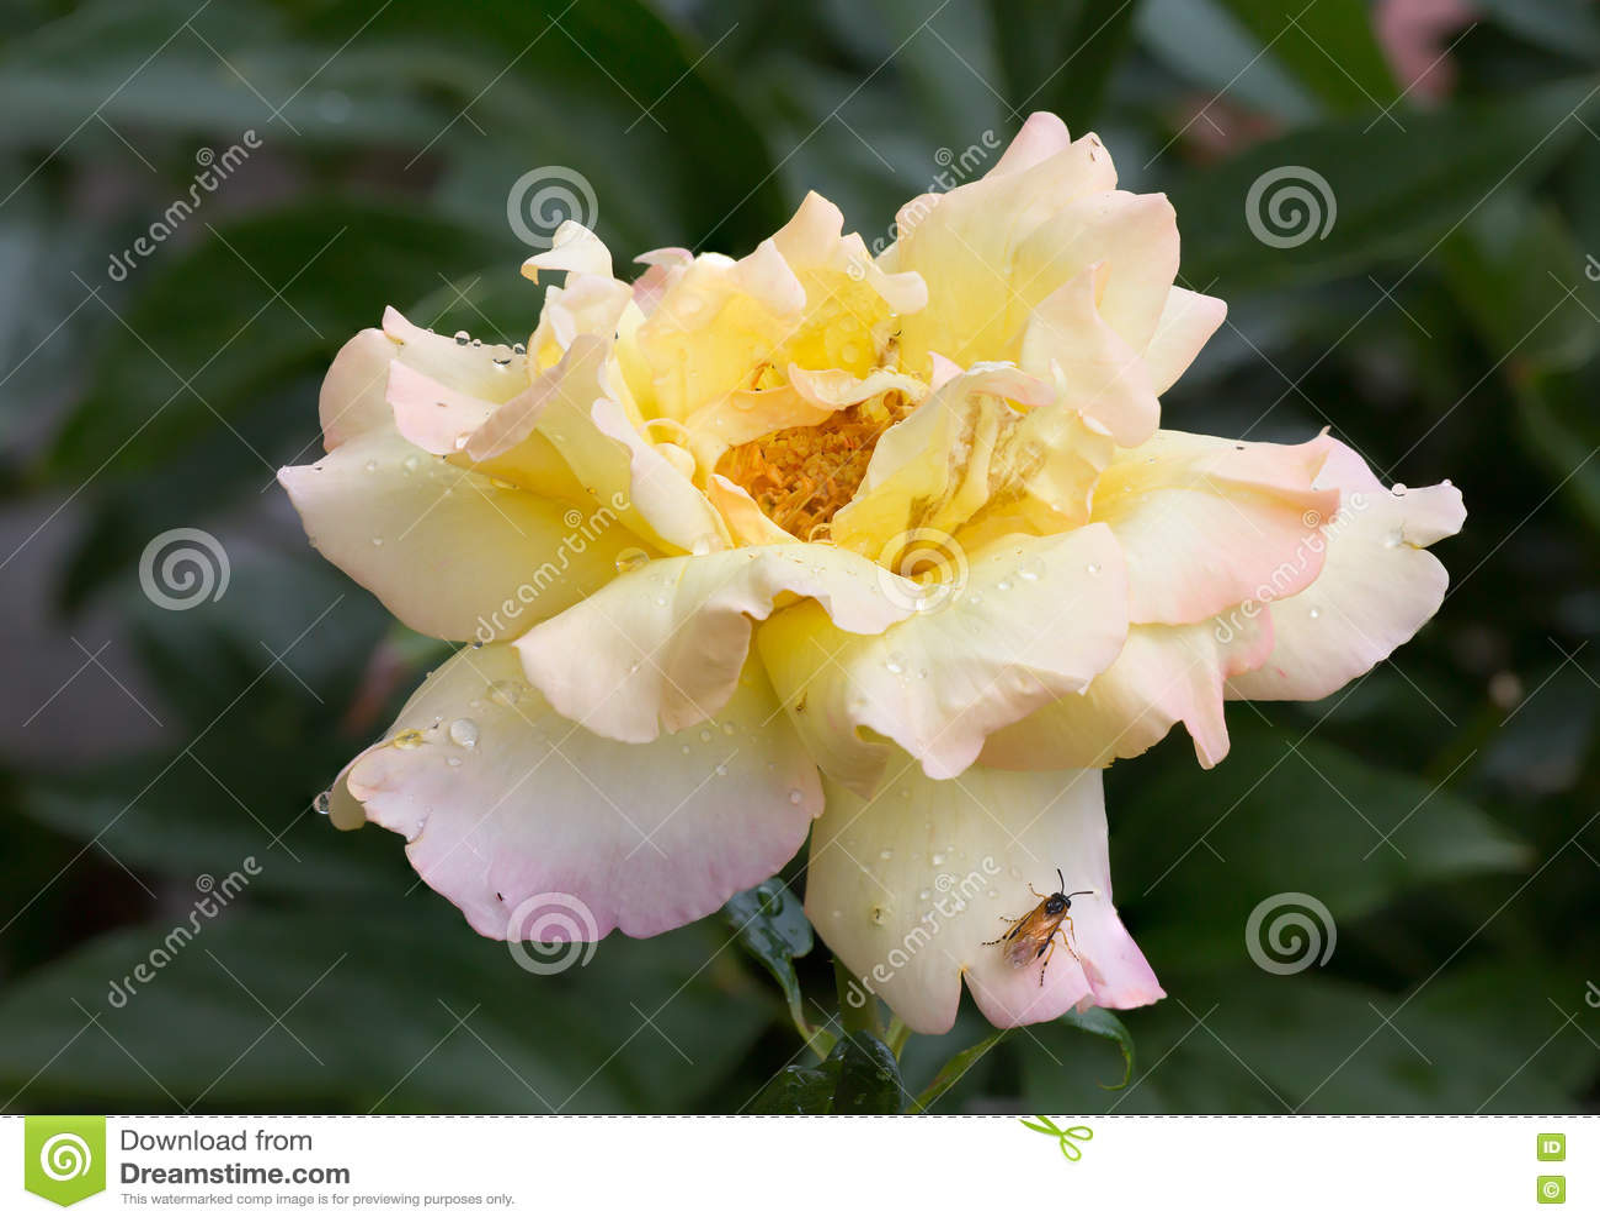 rose gloria day stock image image of gardening pink. Black Bedroom Furniture Sets. Home Design Ideas